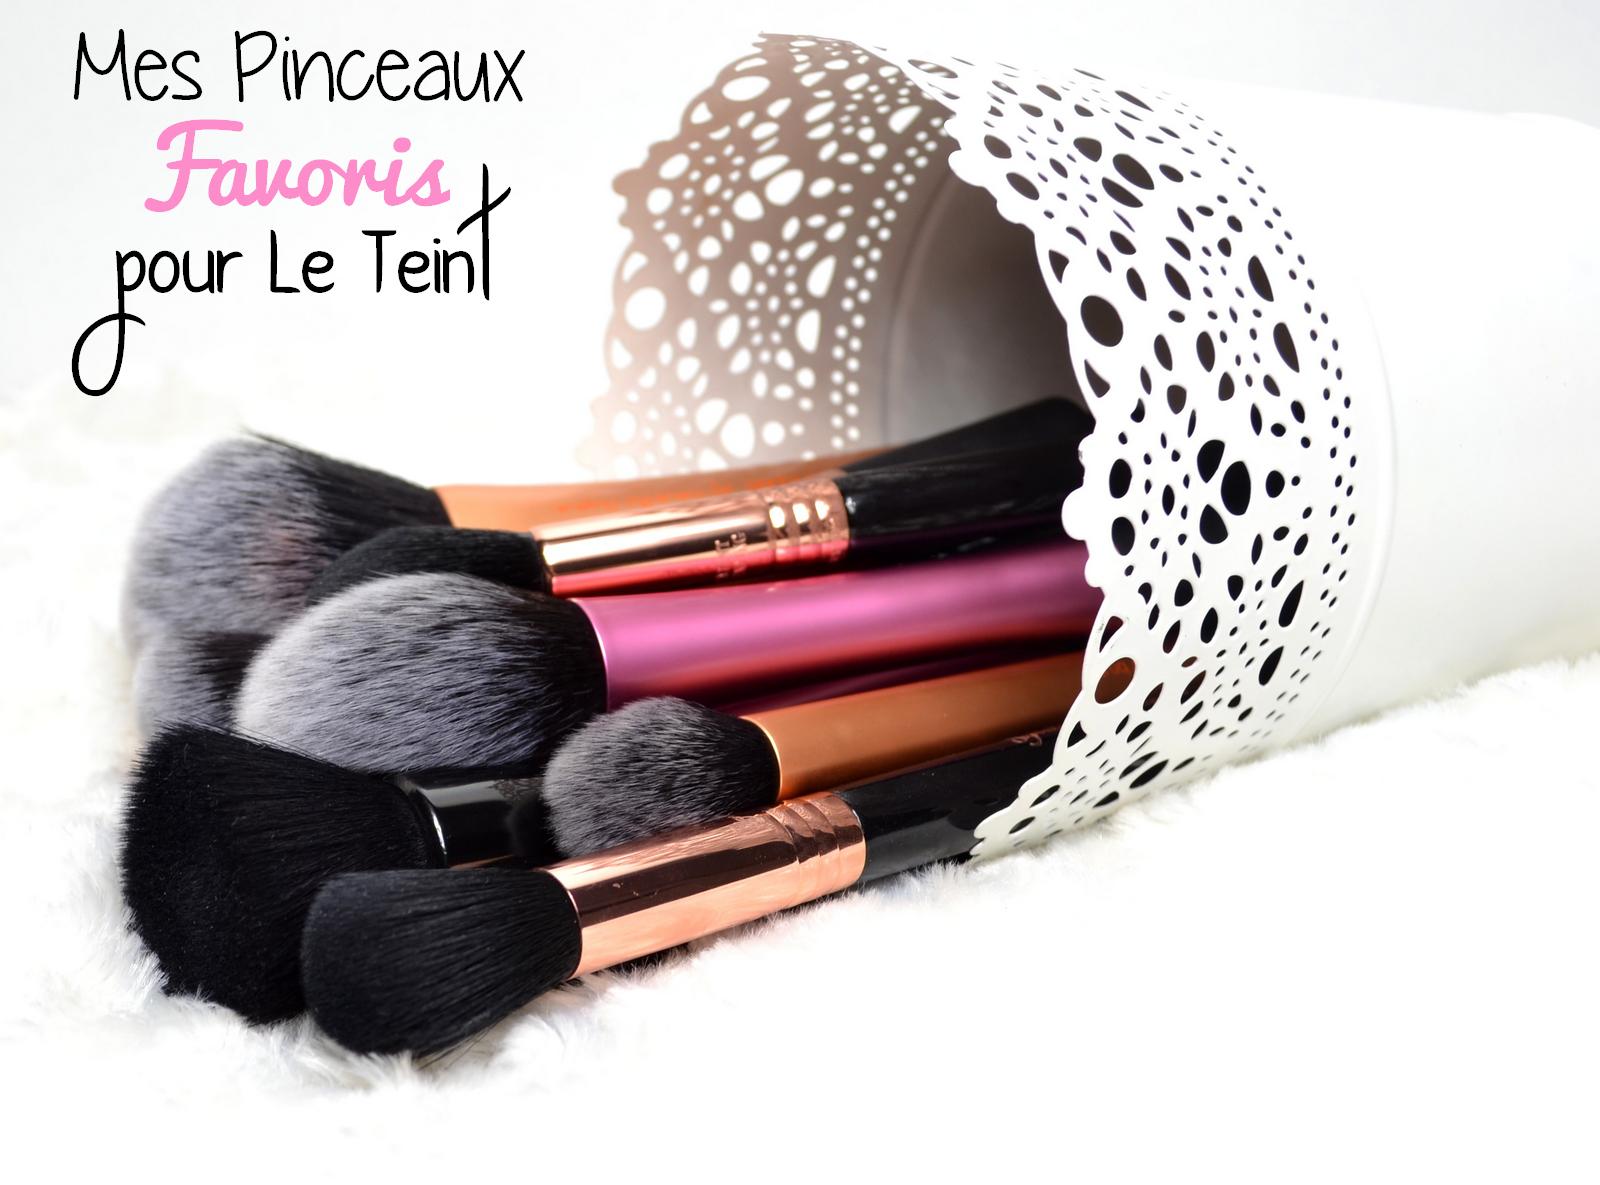 http://www.dreamingsmoothly.com/2014/12/mes-pinceaux-favoris-pour-le-teint.html